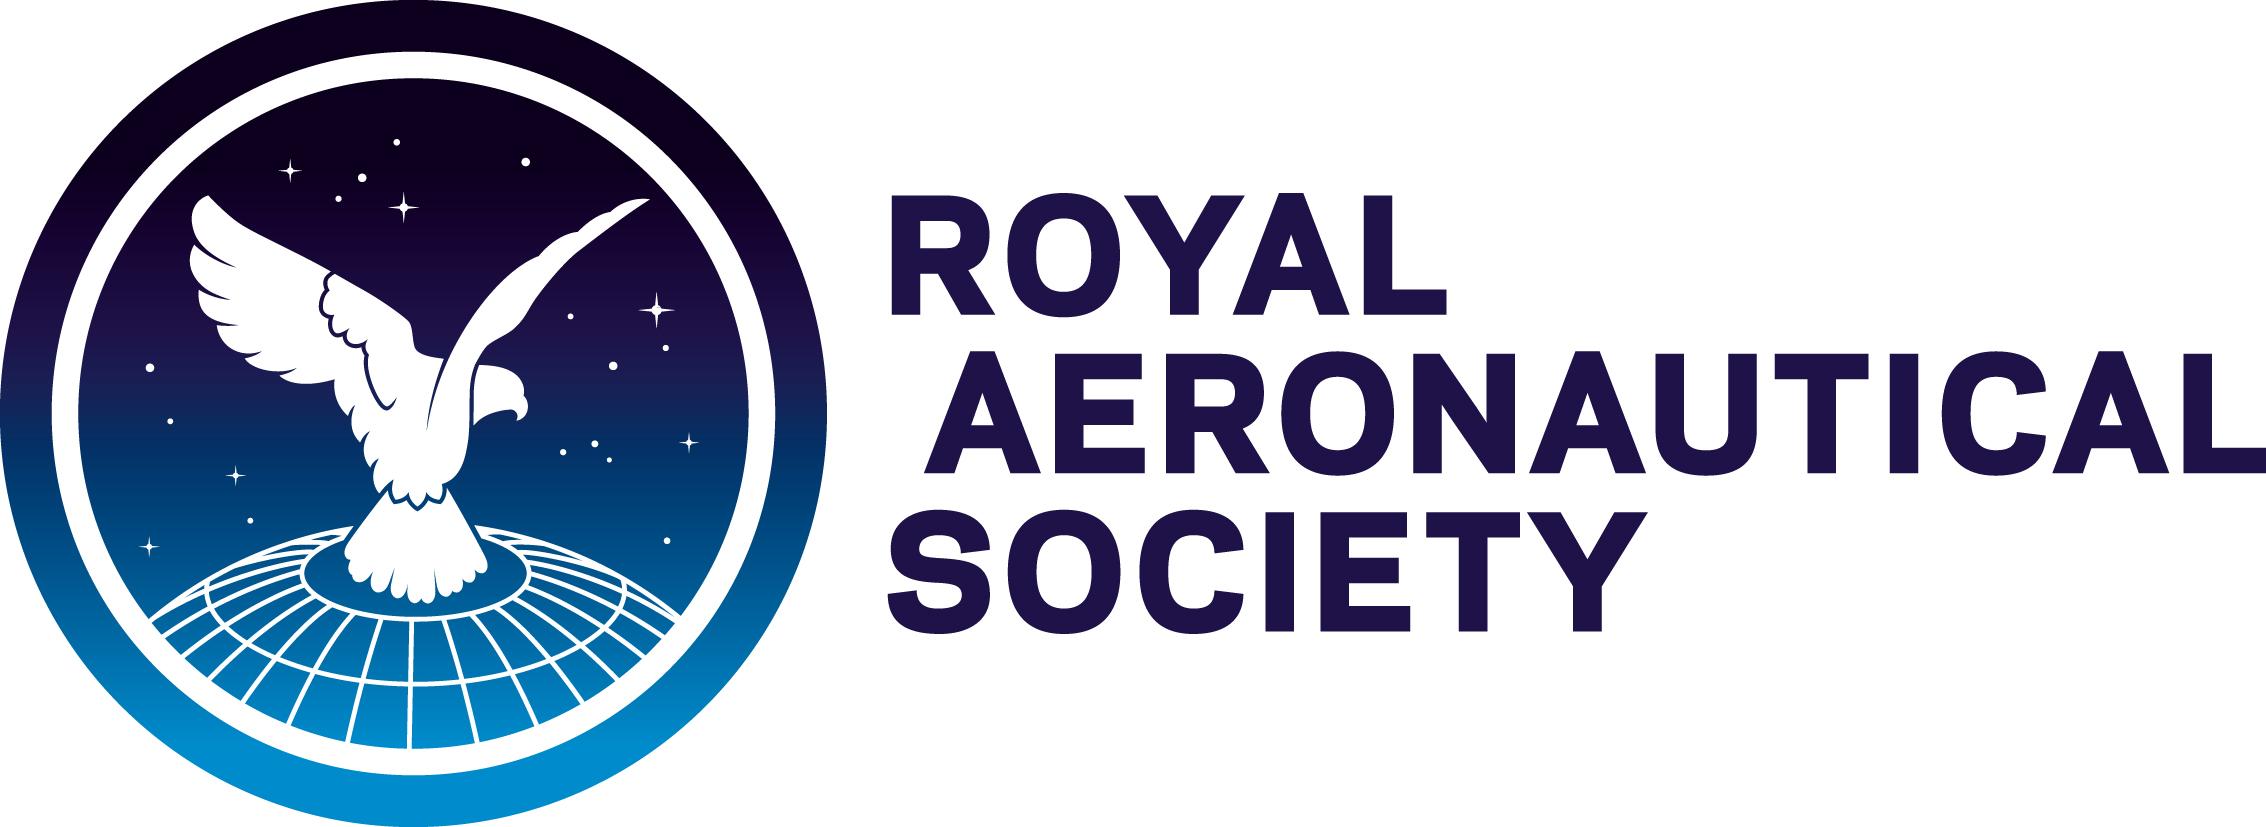 Royal Aeronautical Society, RAeS